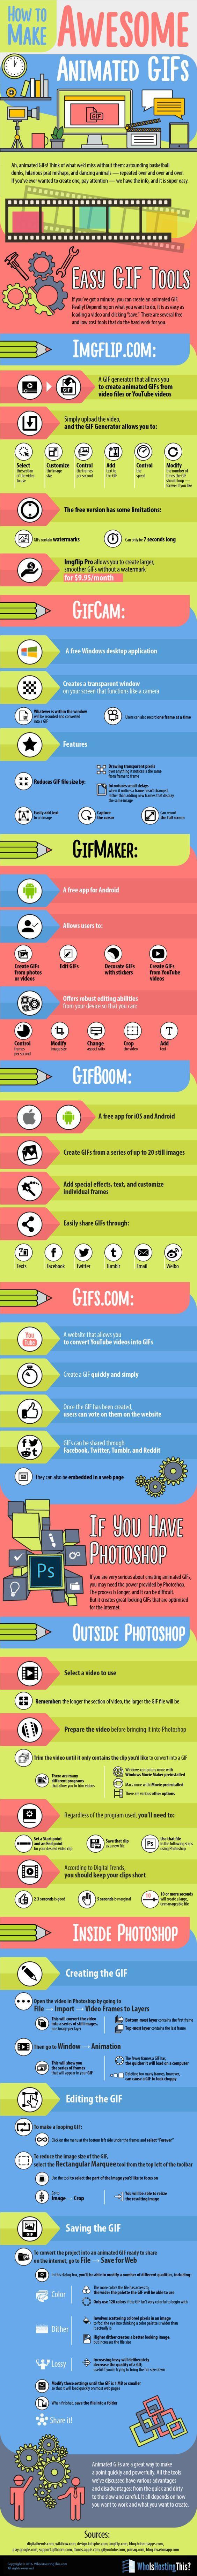 Cómo hacer GIFs [Infografía] vía @TreceBits http://blgs.co/kb3q2g